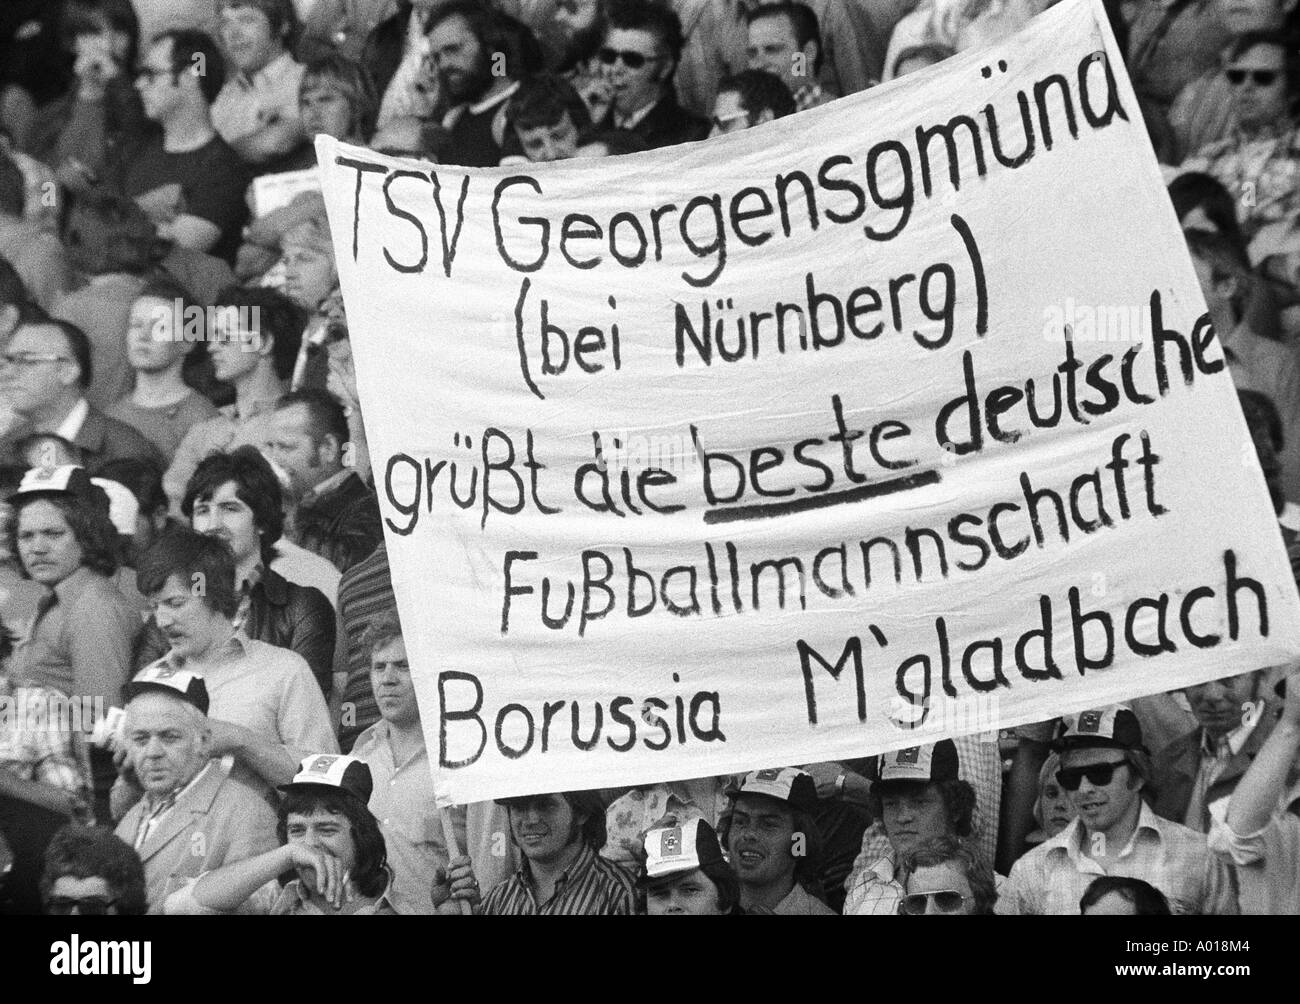 football, Bundesliga, 1973/1974, Borussia Moenchengladbach versus Bayern Munich 5:0, Boekelberg Stadium, fans holding a bannercelebrating the team of Moenchengladbach, b&w, black and white, black & white photography - Stock Image